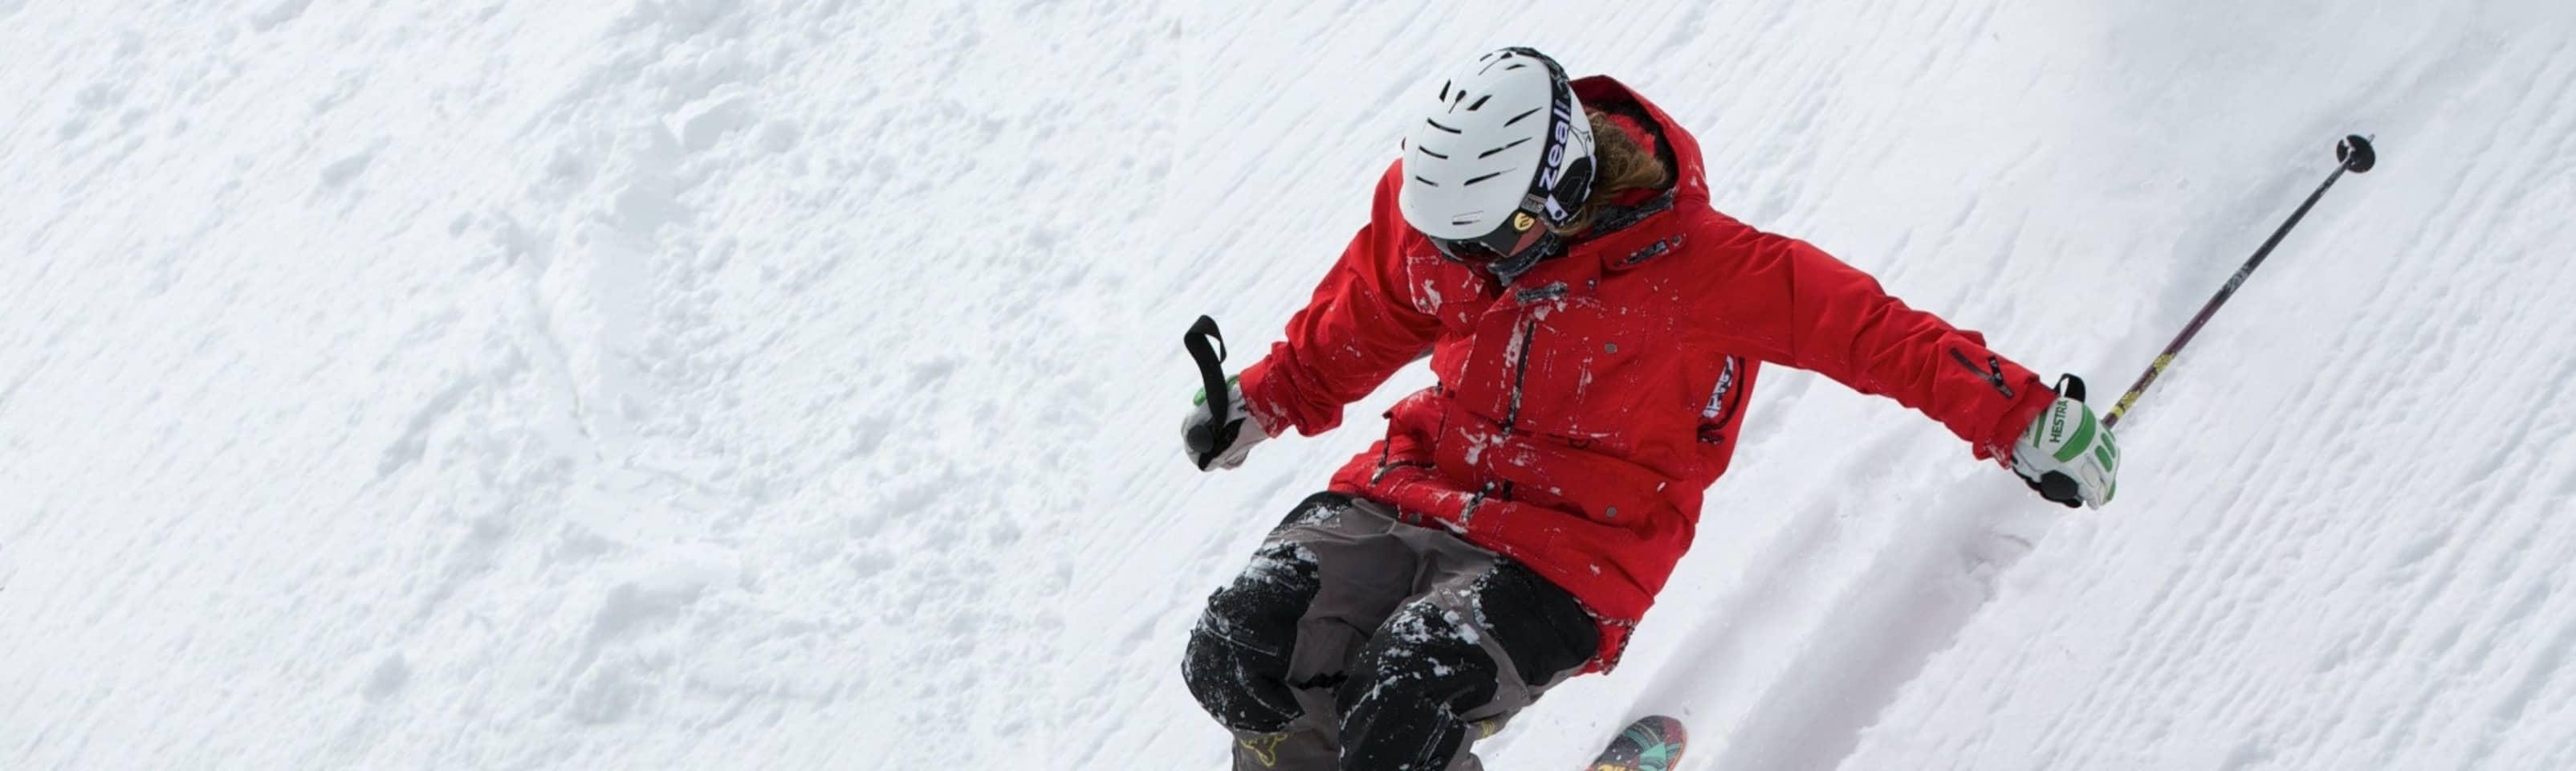 Falls Creek & Mount Hotham Ski Resorts